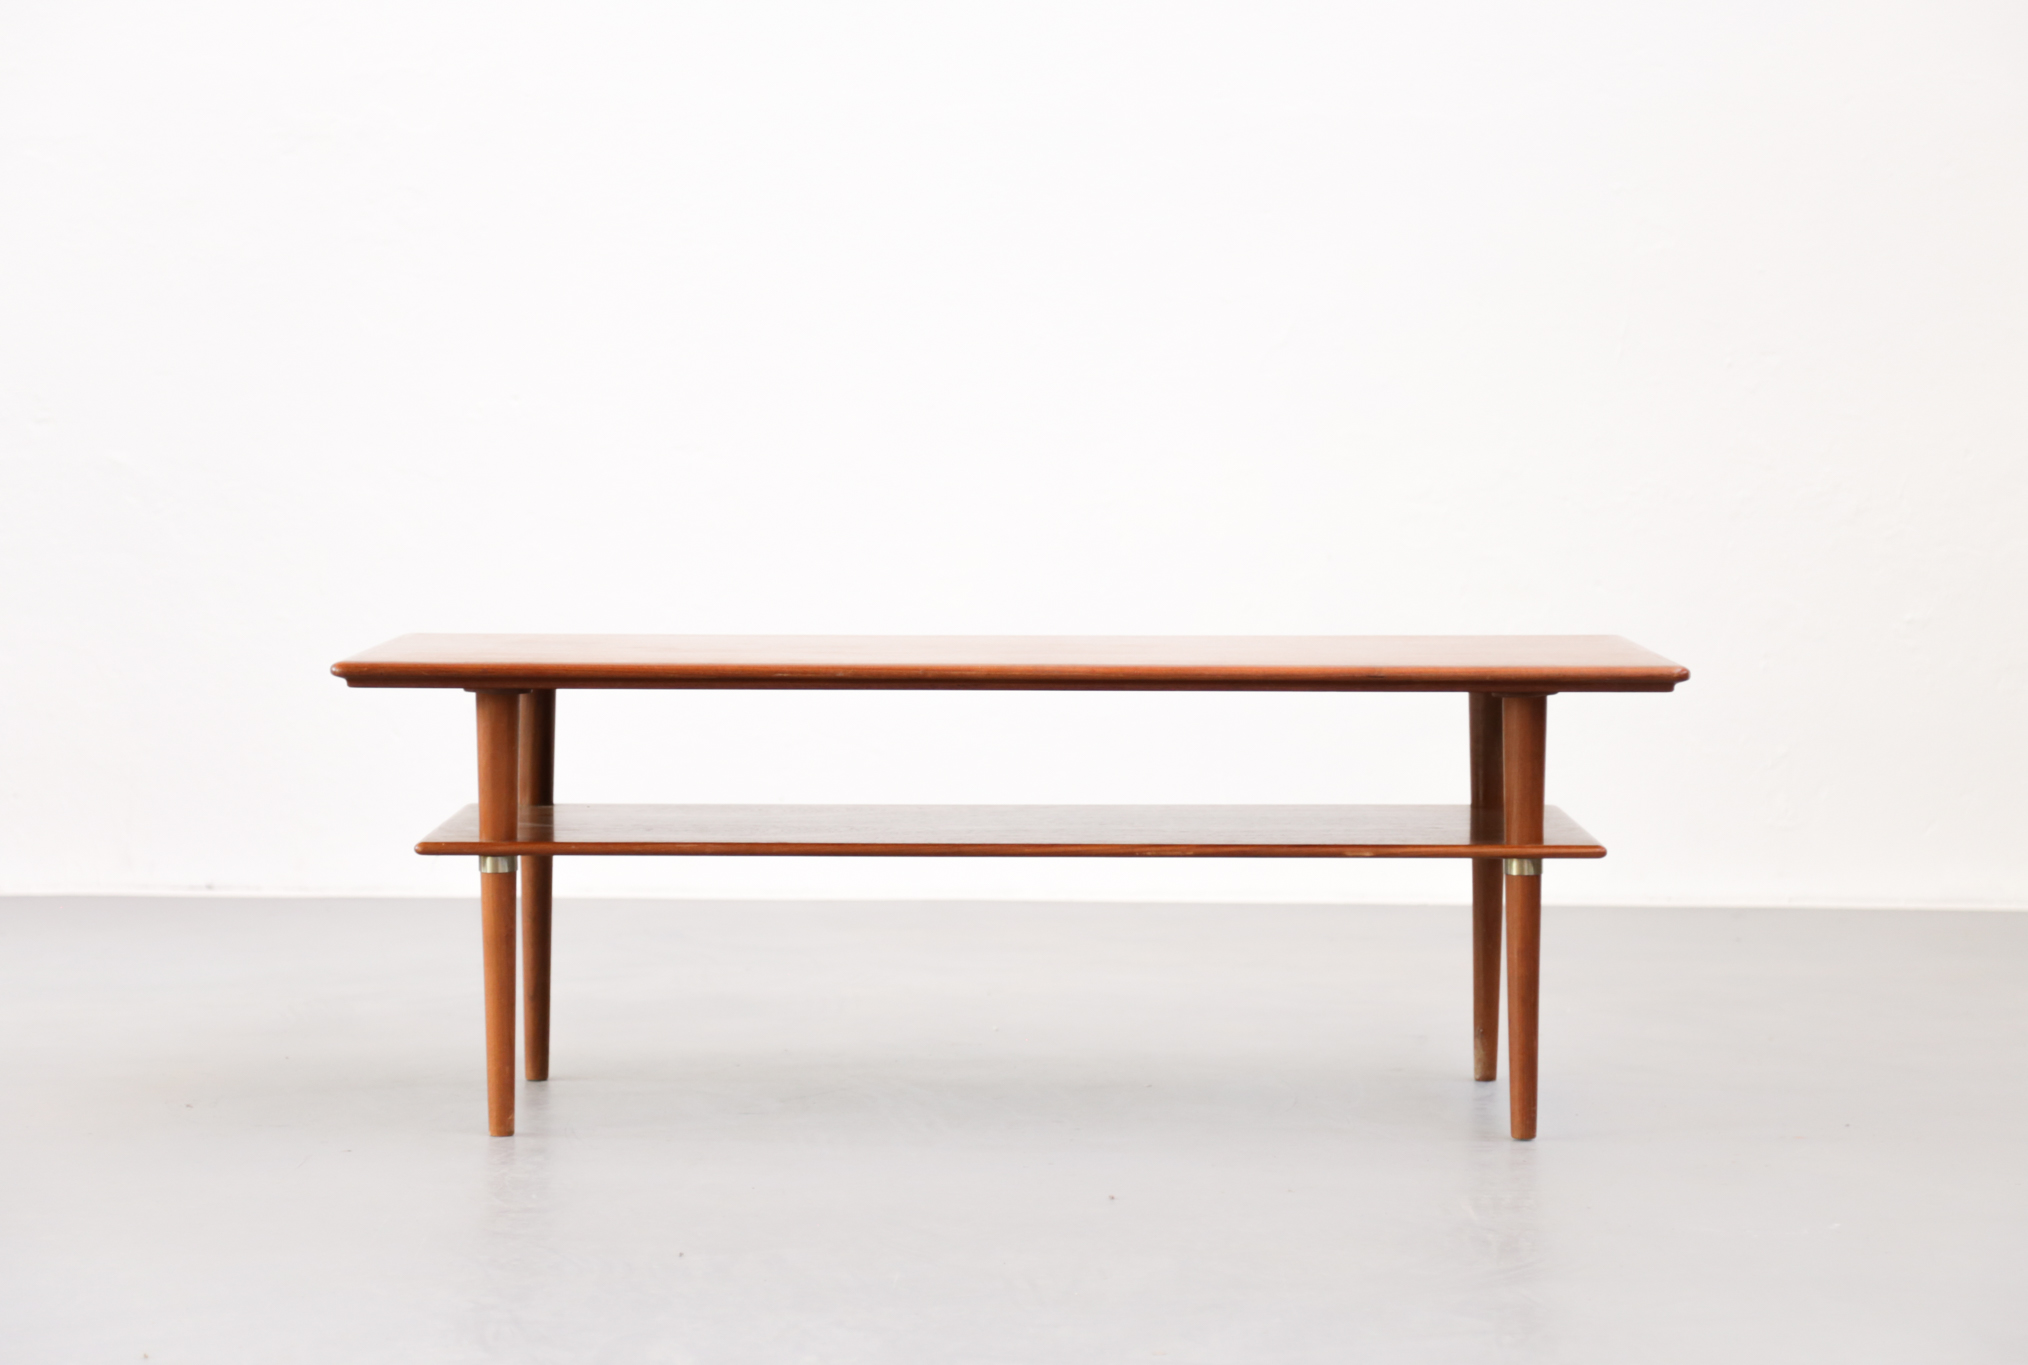 Table basse scandinave en teck elsteds mobelfabrik danke - Table basse design scandinave ...